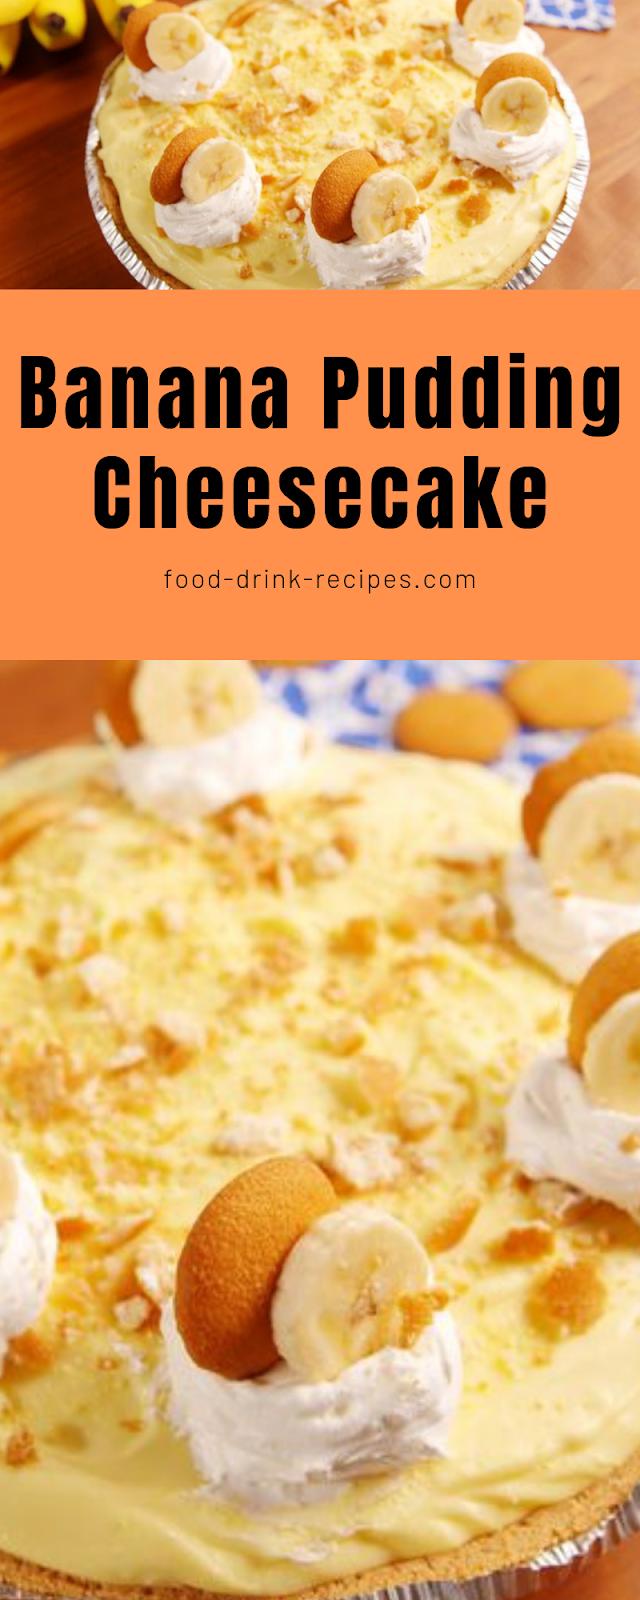 Banana Pudding Cheesecake - food-drink-recipes.com